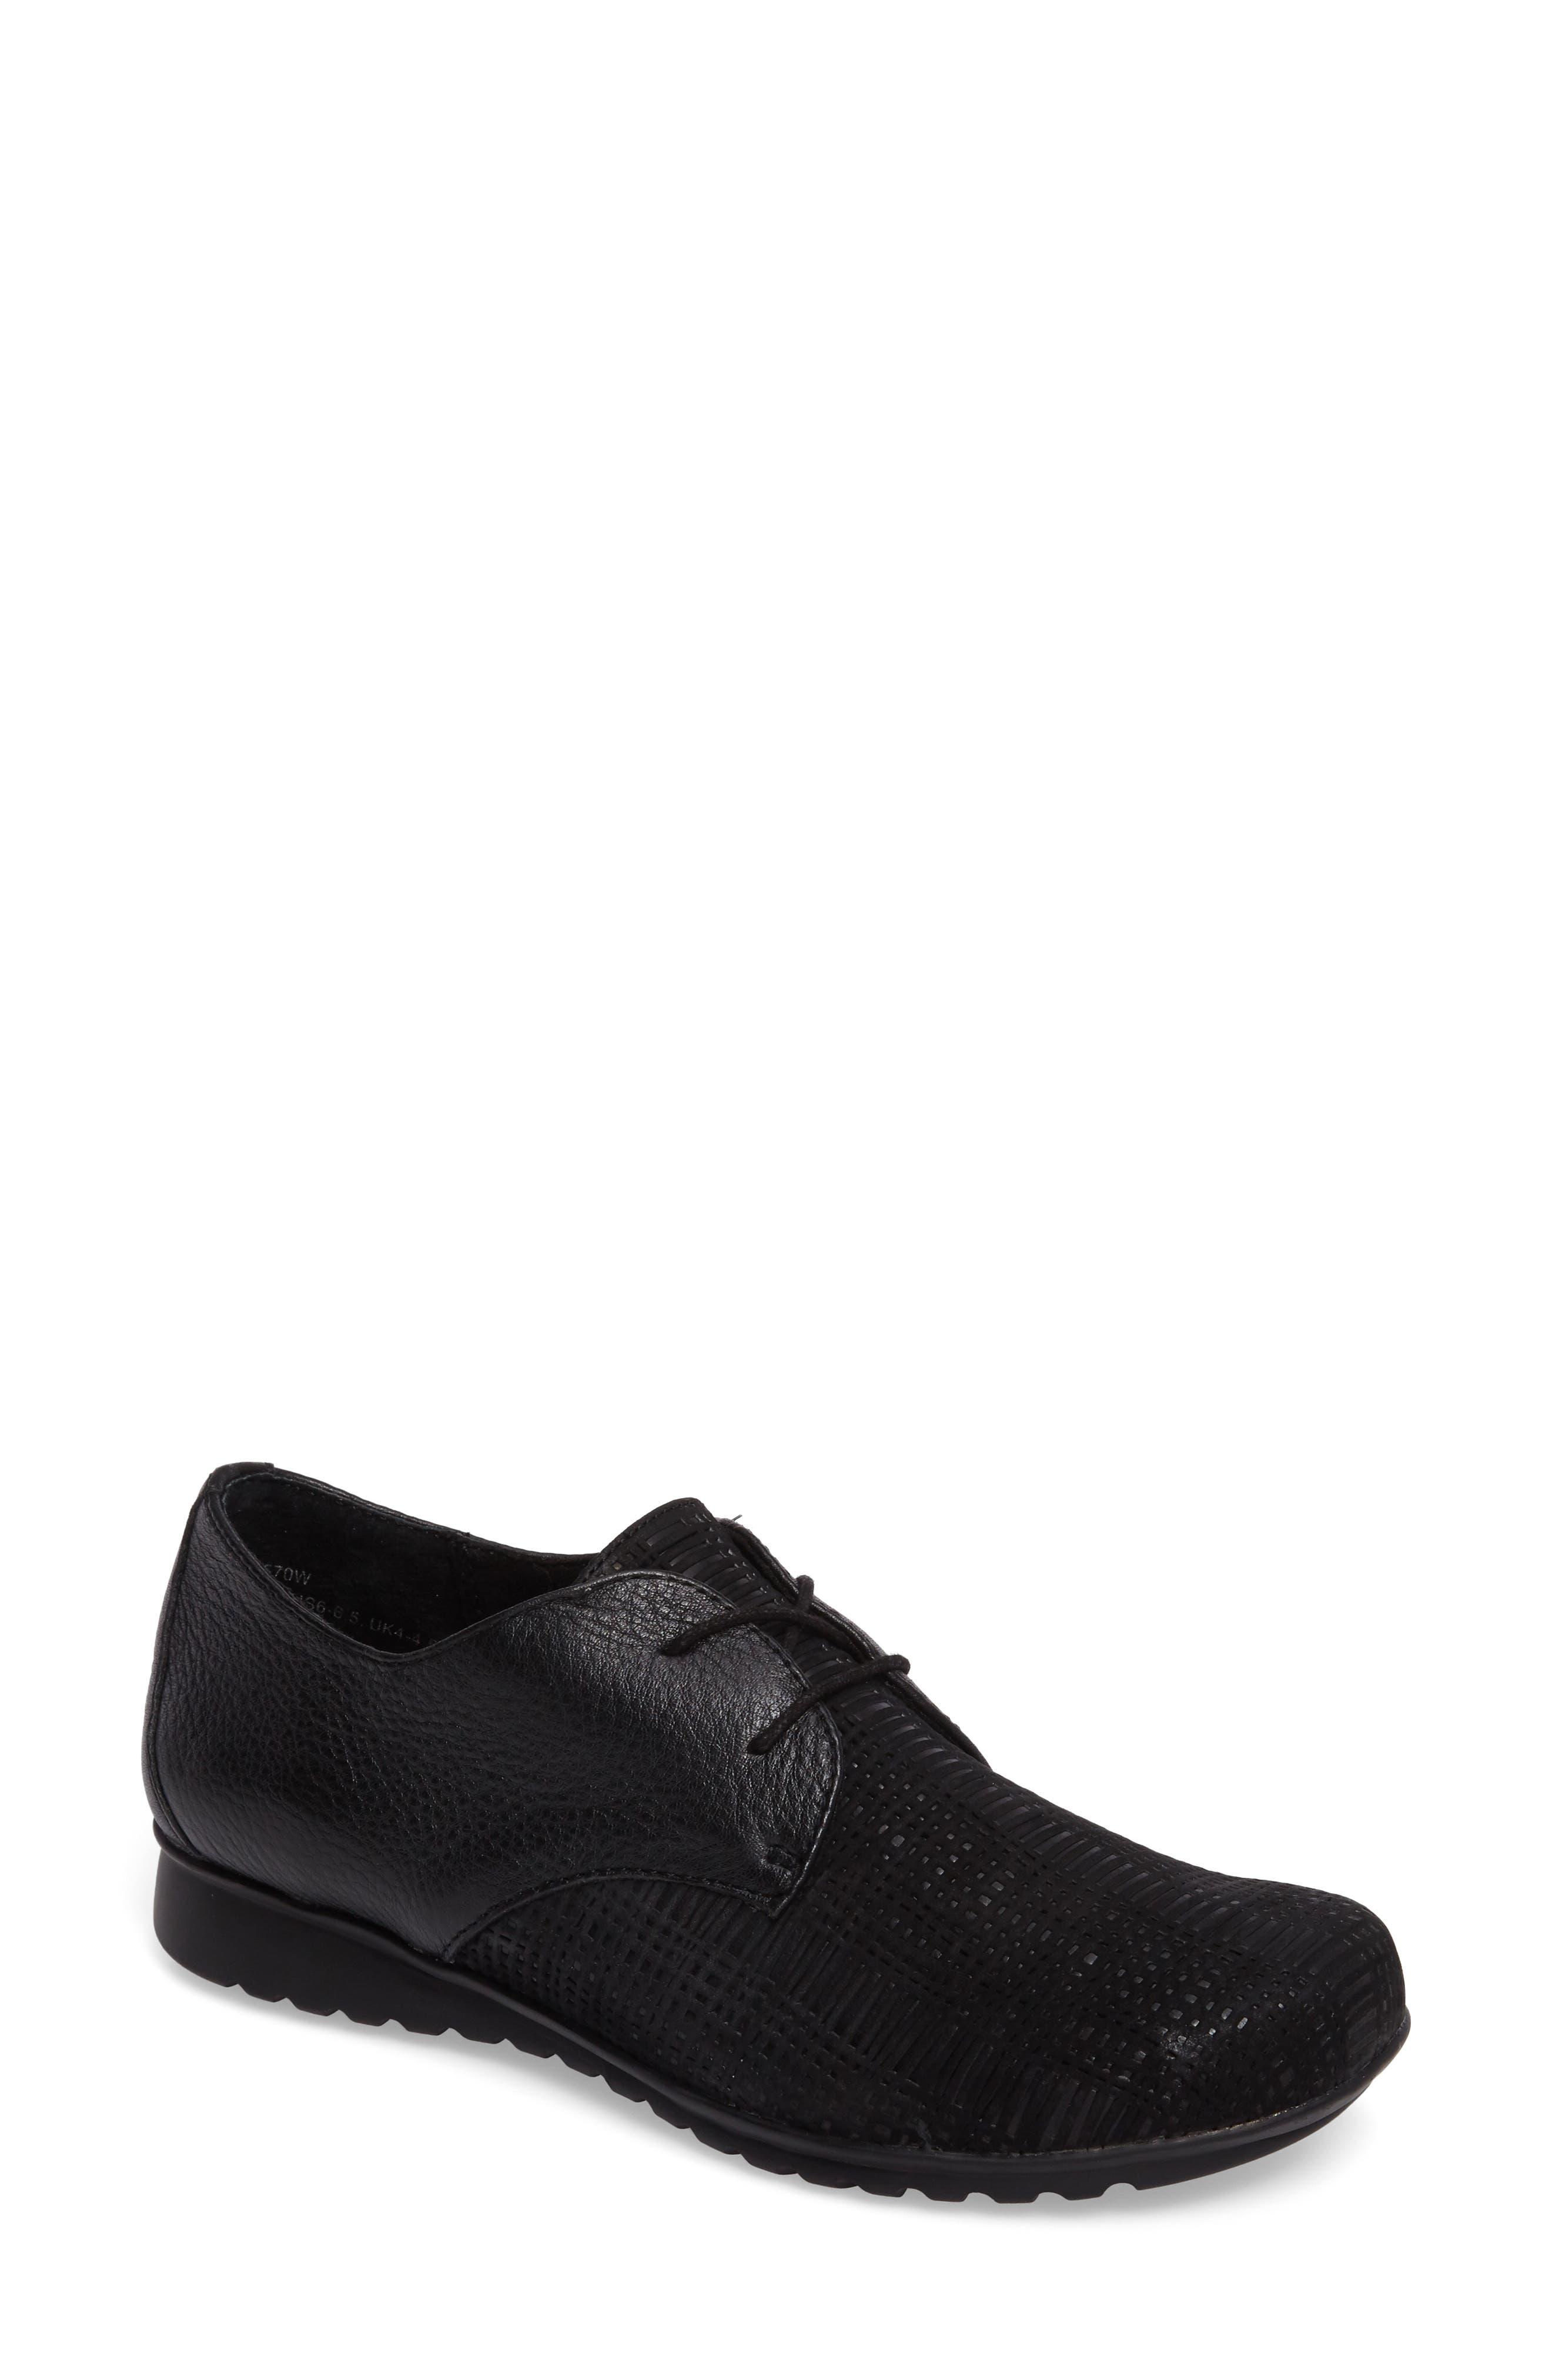 Aetrex Erin Saddle Shoe, Black